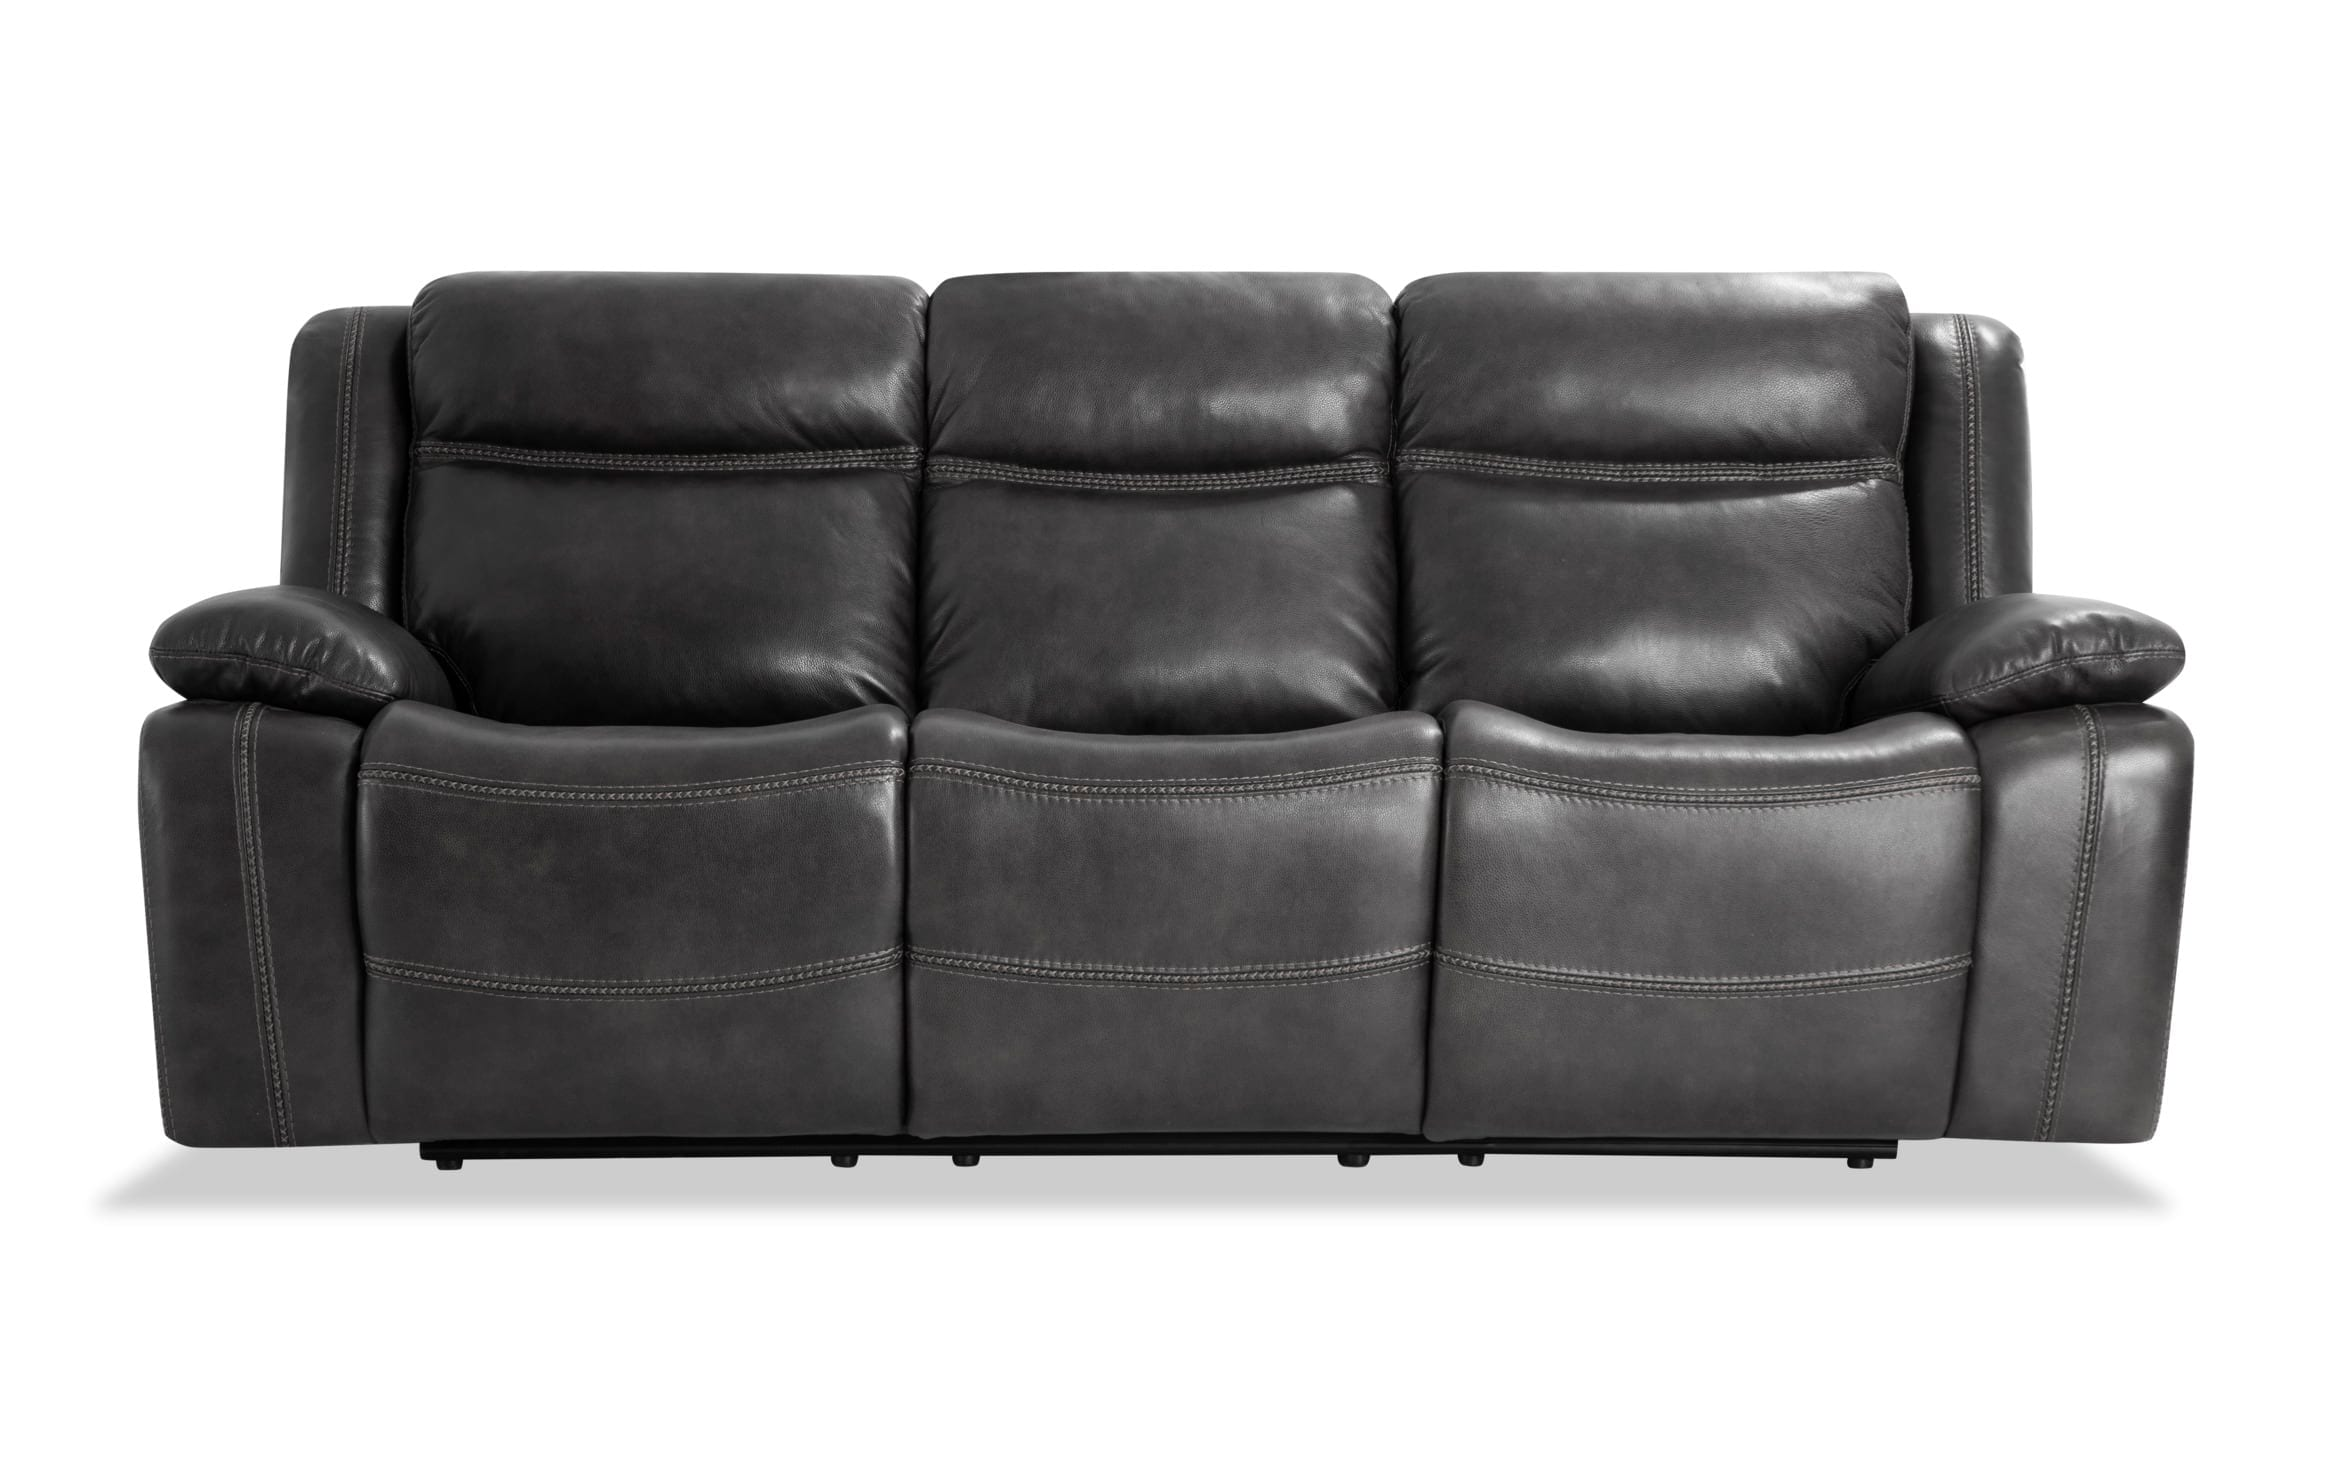 trailblazer gray leather power reclining sofa